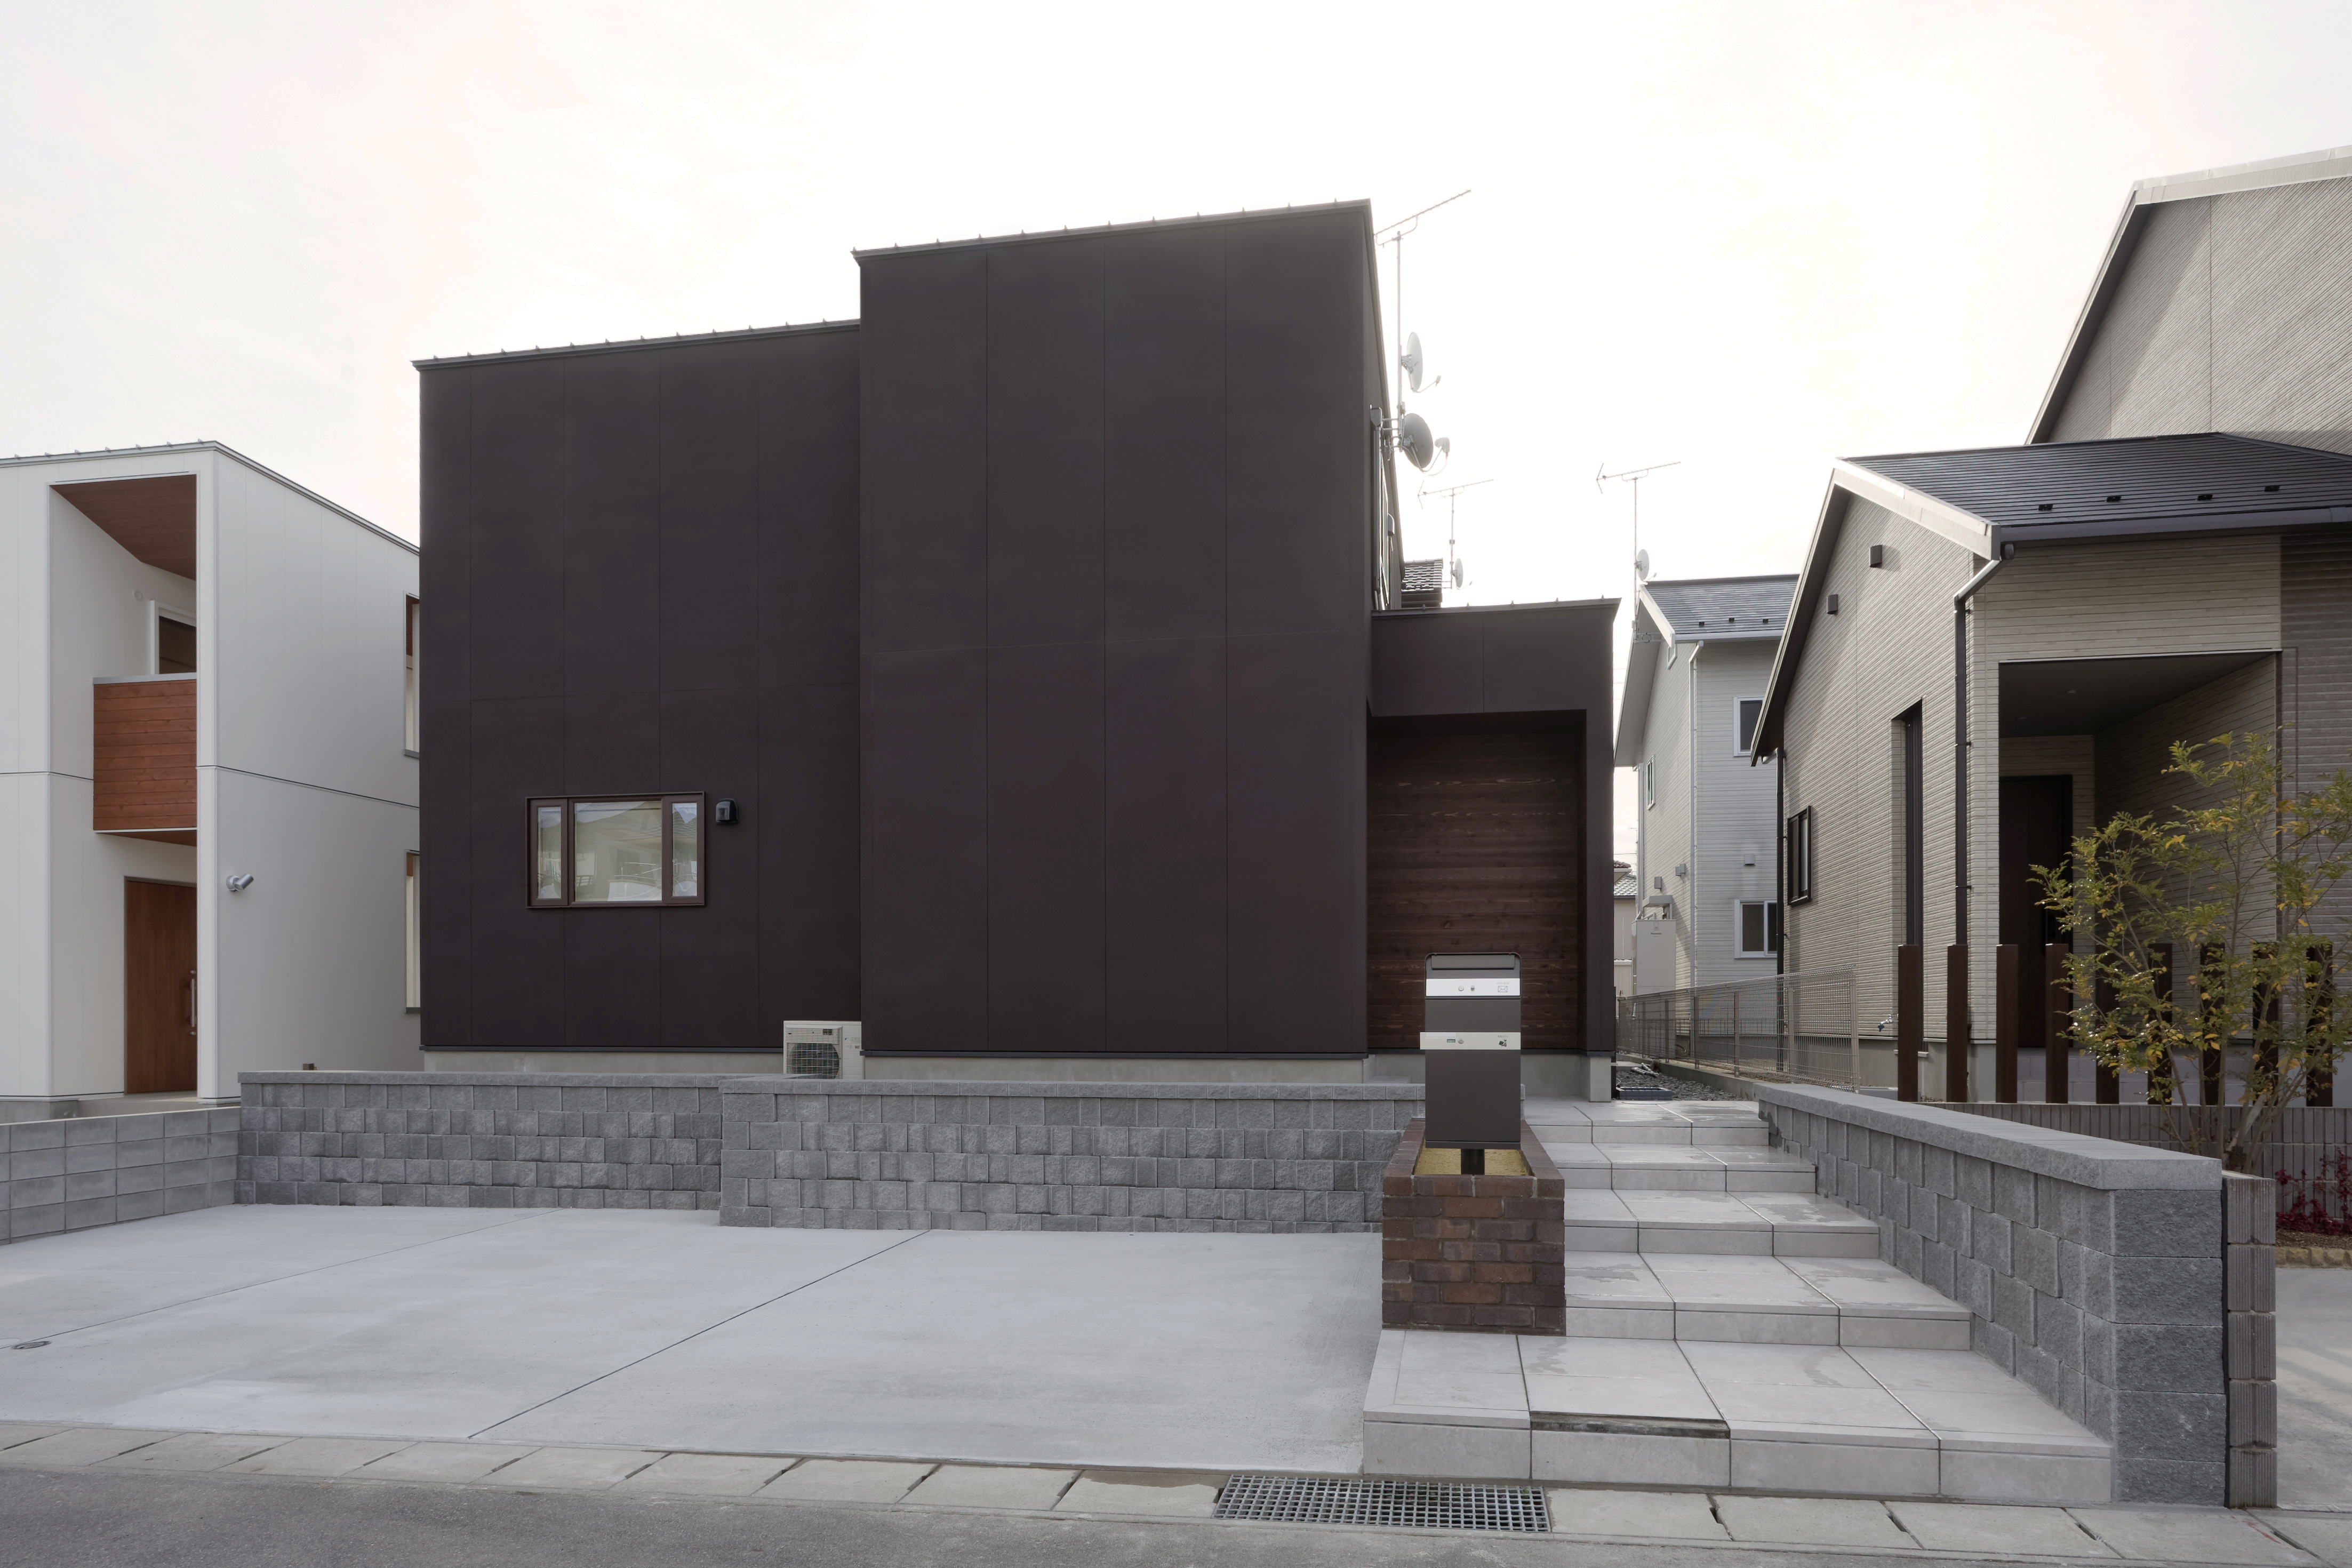 R+houseいわき S様邸